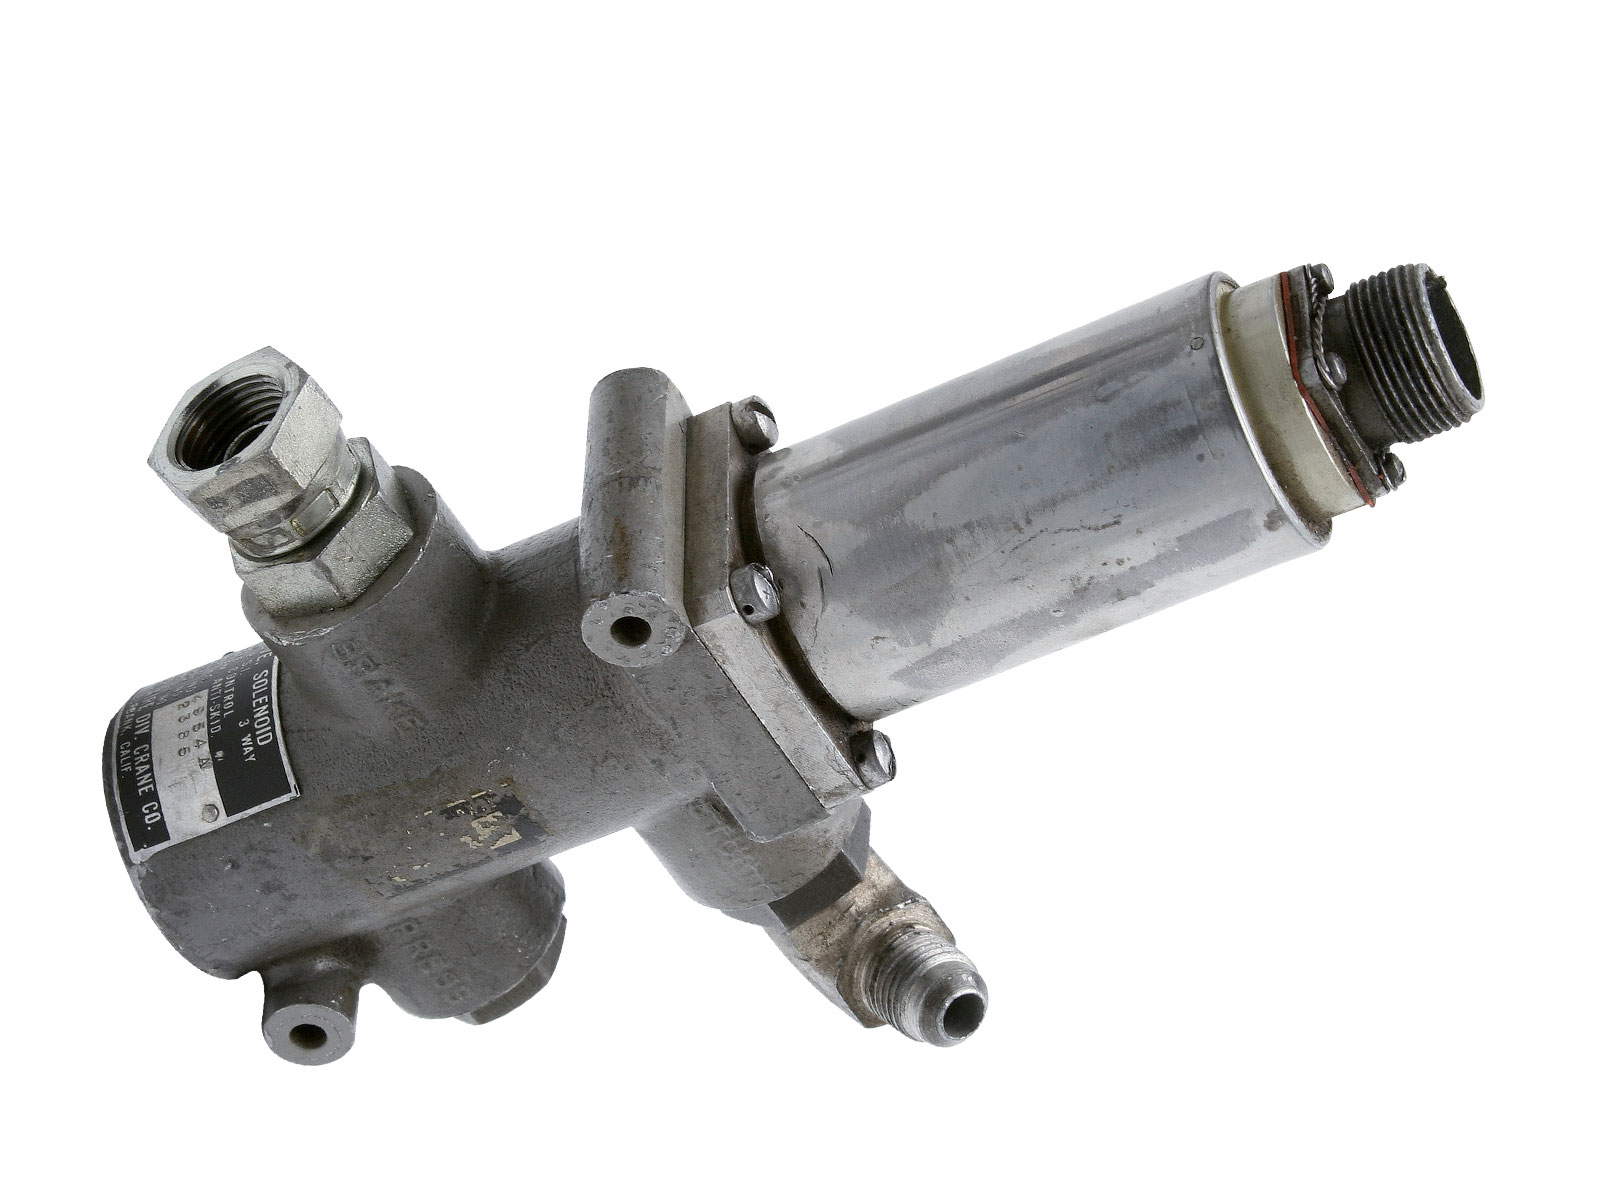 Hydraulic Parts - Deluxe - Lowrider Magazine